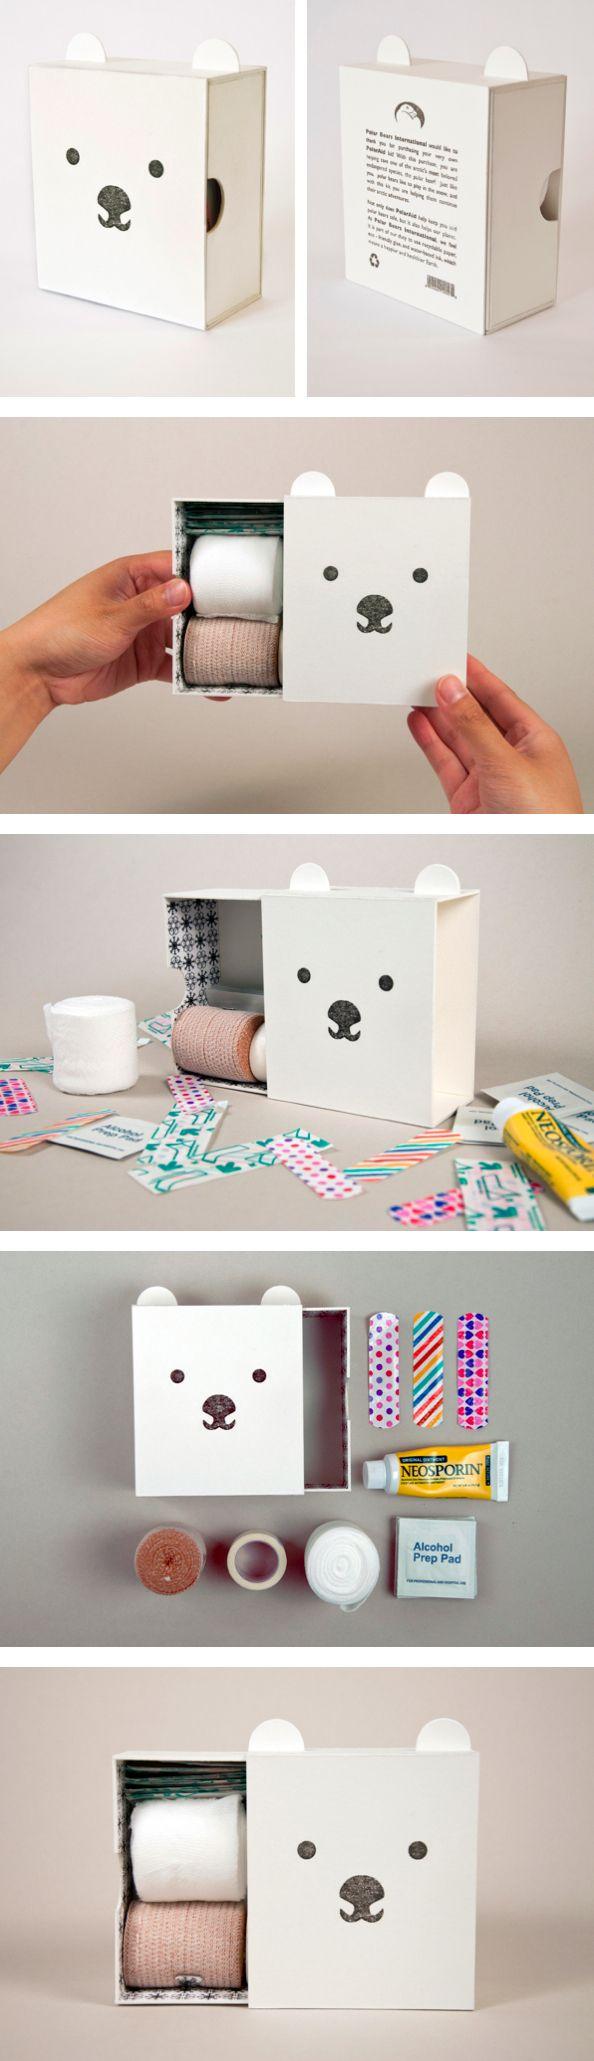 PolarAid Kit - sustainable first aid kit for children by Amy Chen http://www.behance.net/gallery/PolarAid-Kit/8500939